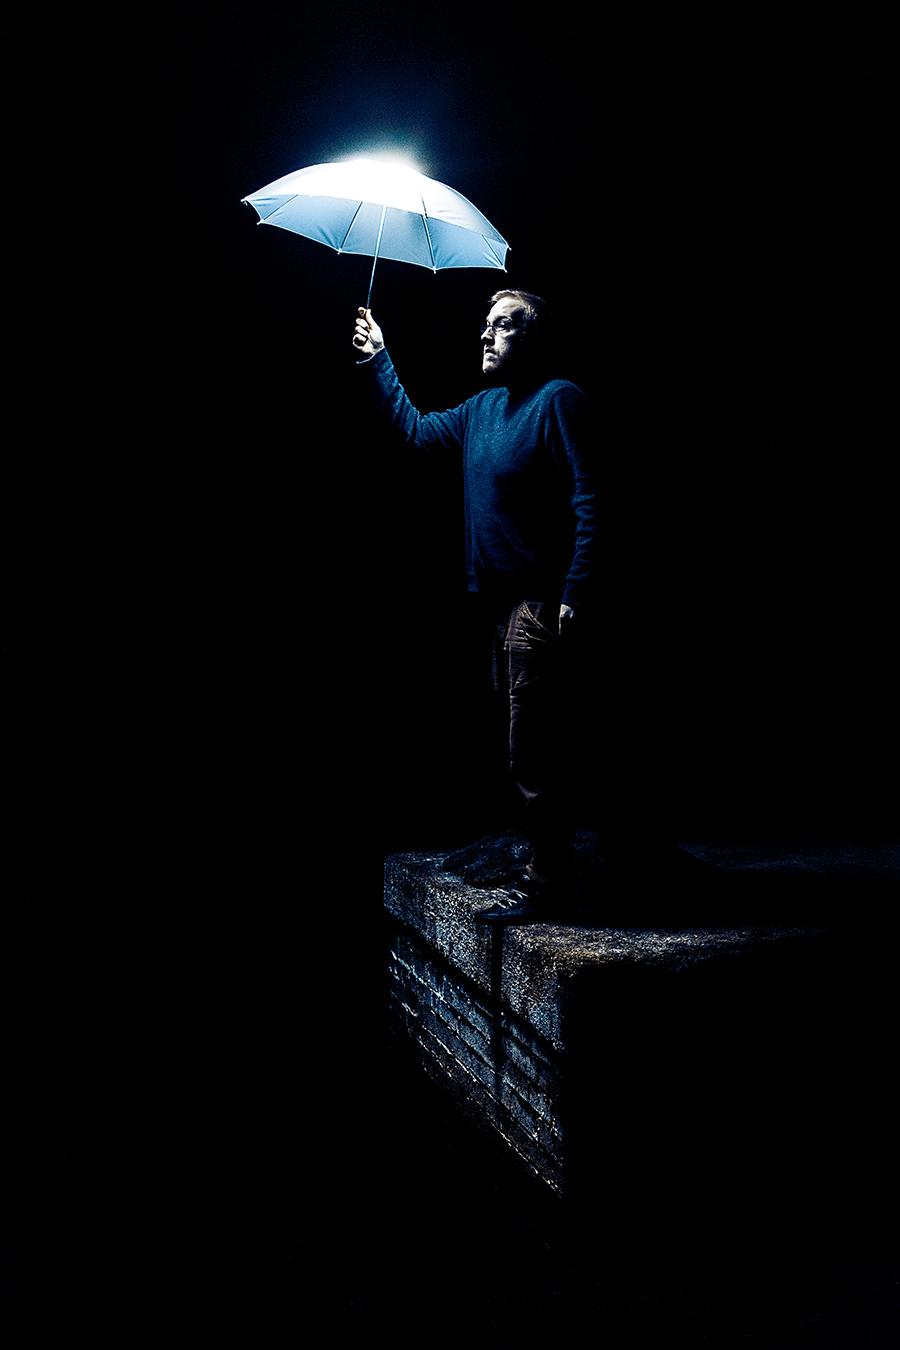 blue umbrella.jpg